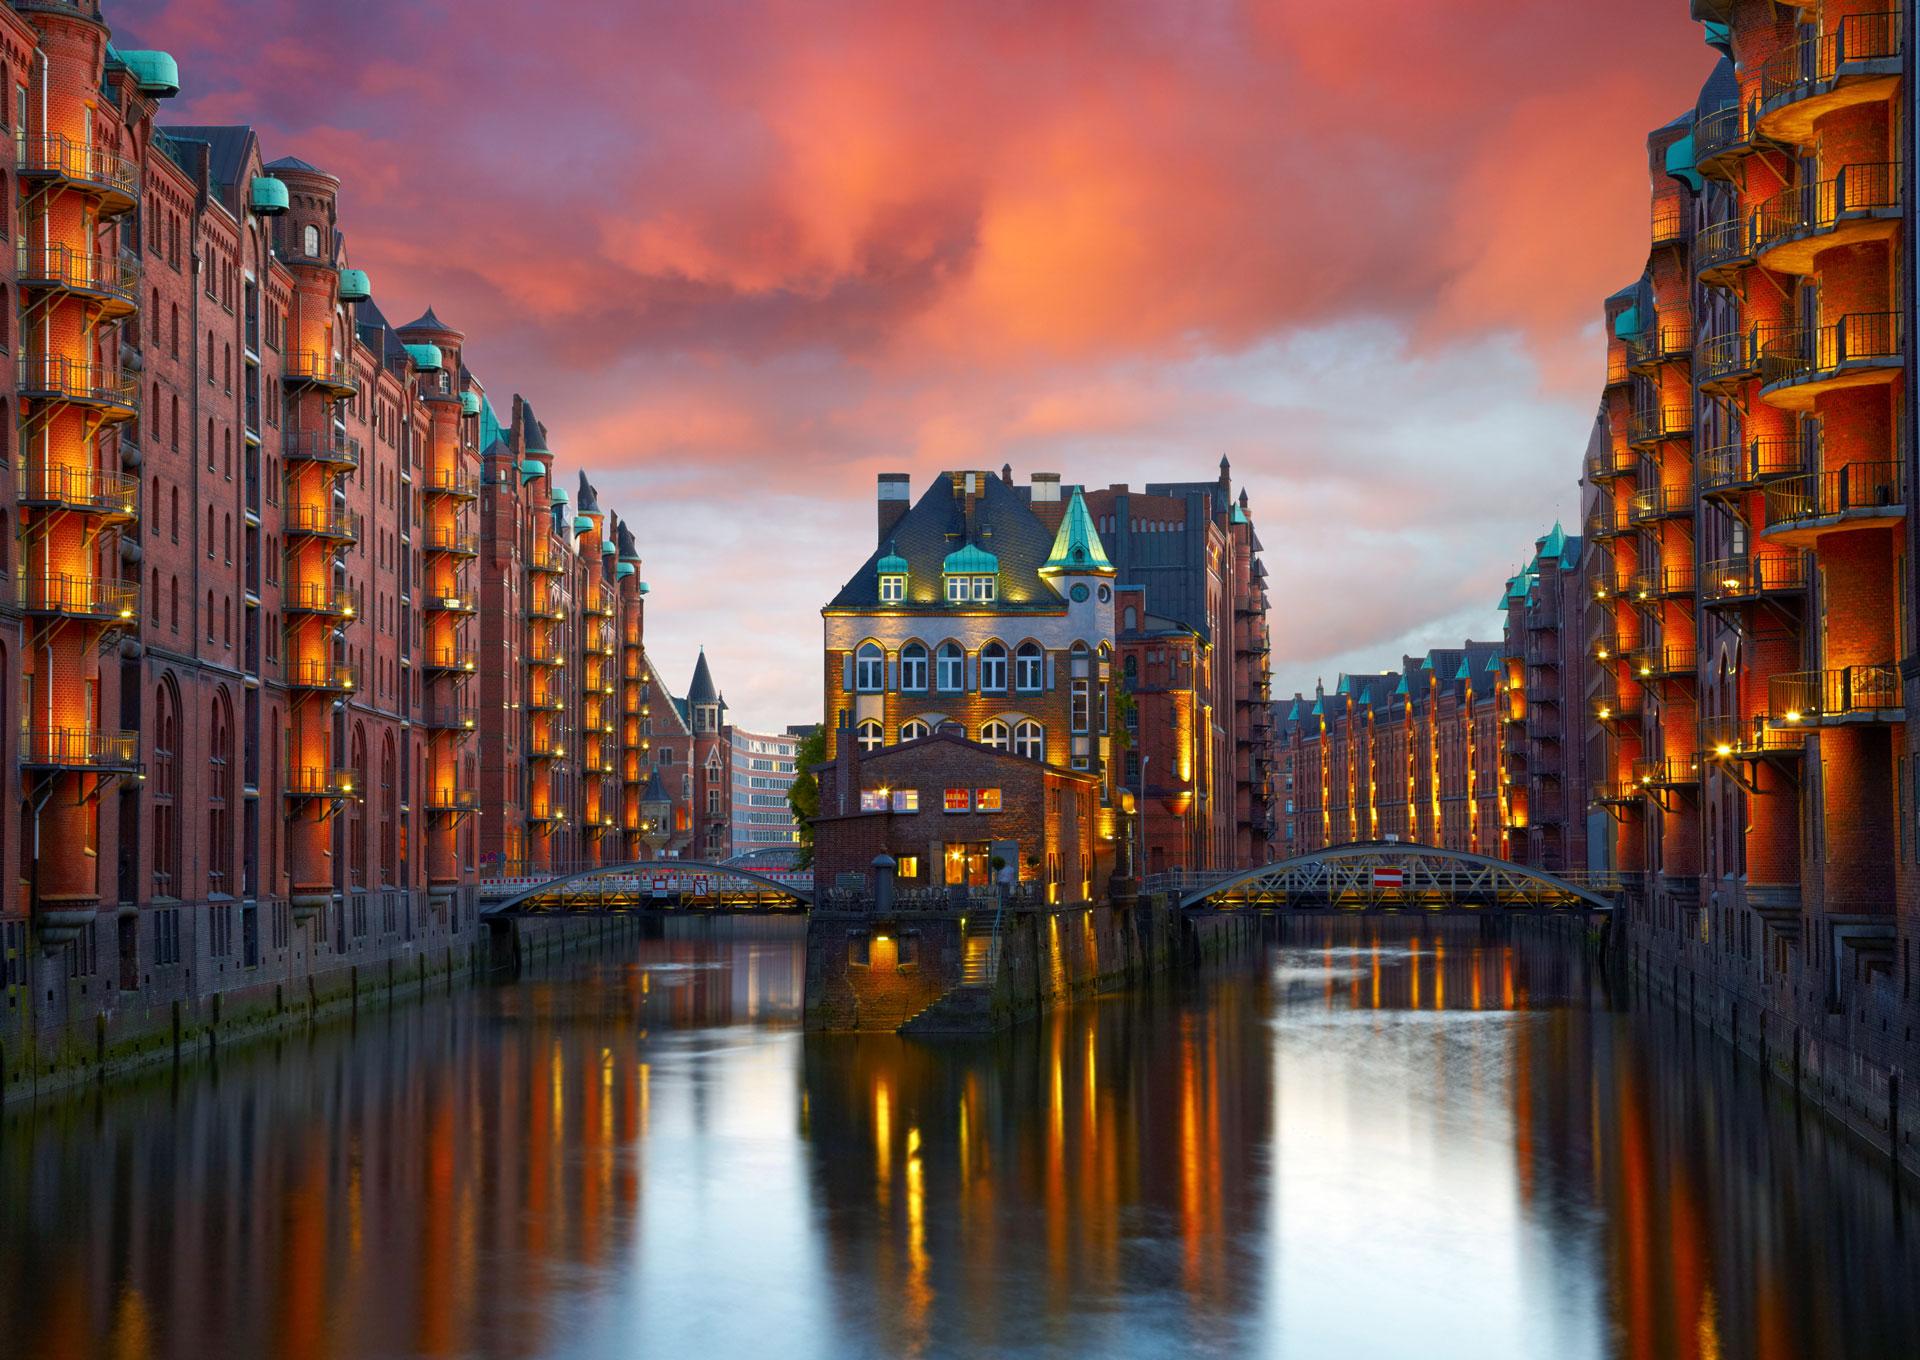 Beautiful buildings along canal